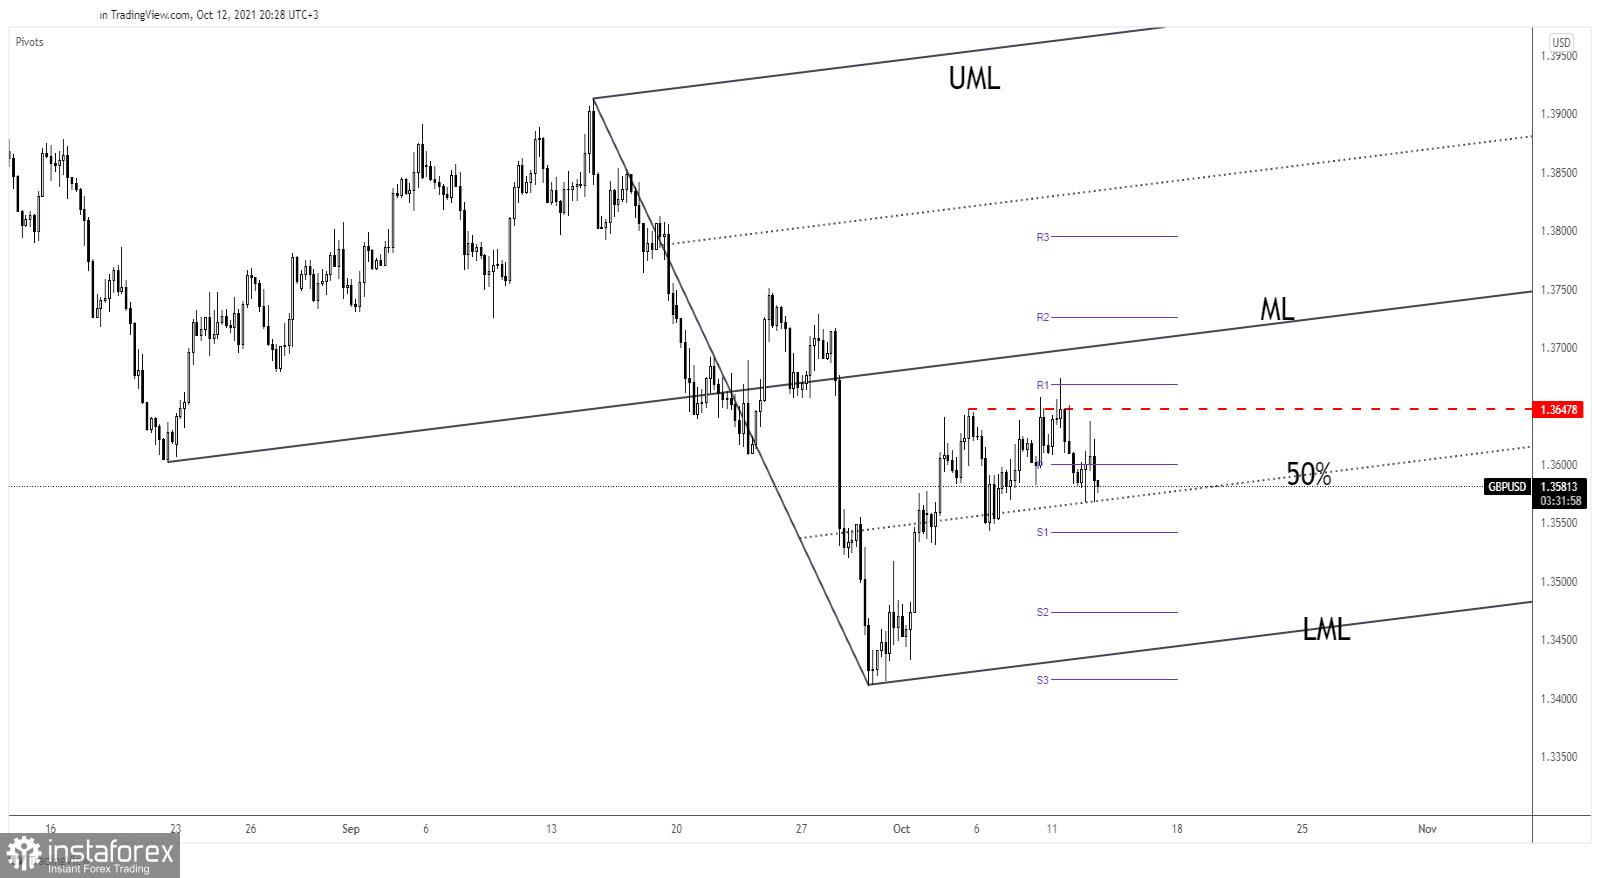 GBP/USD upside seems limited, downside needs confirmation